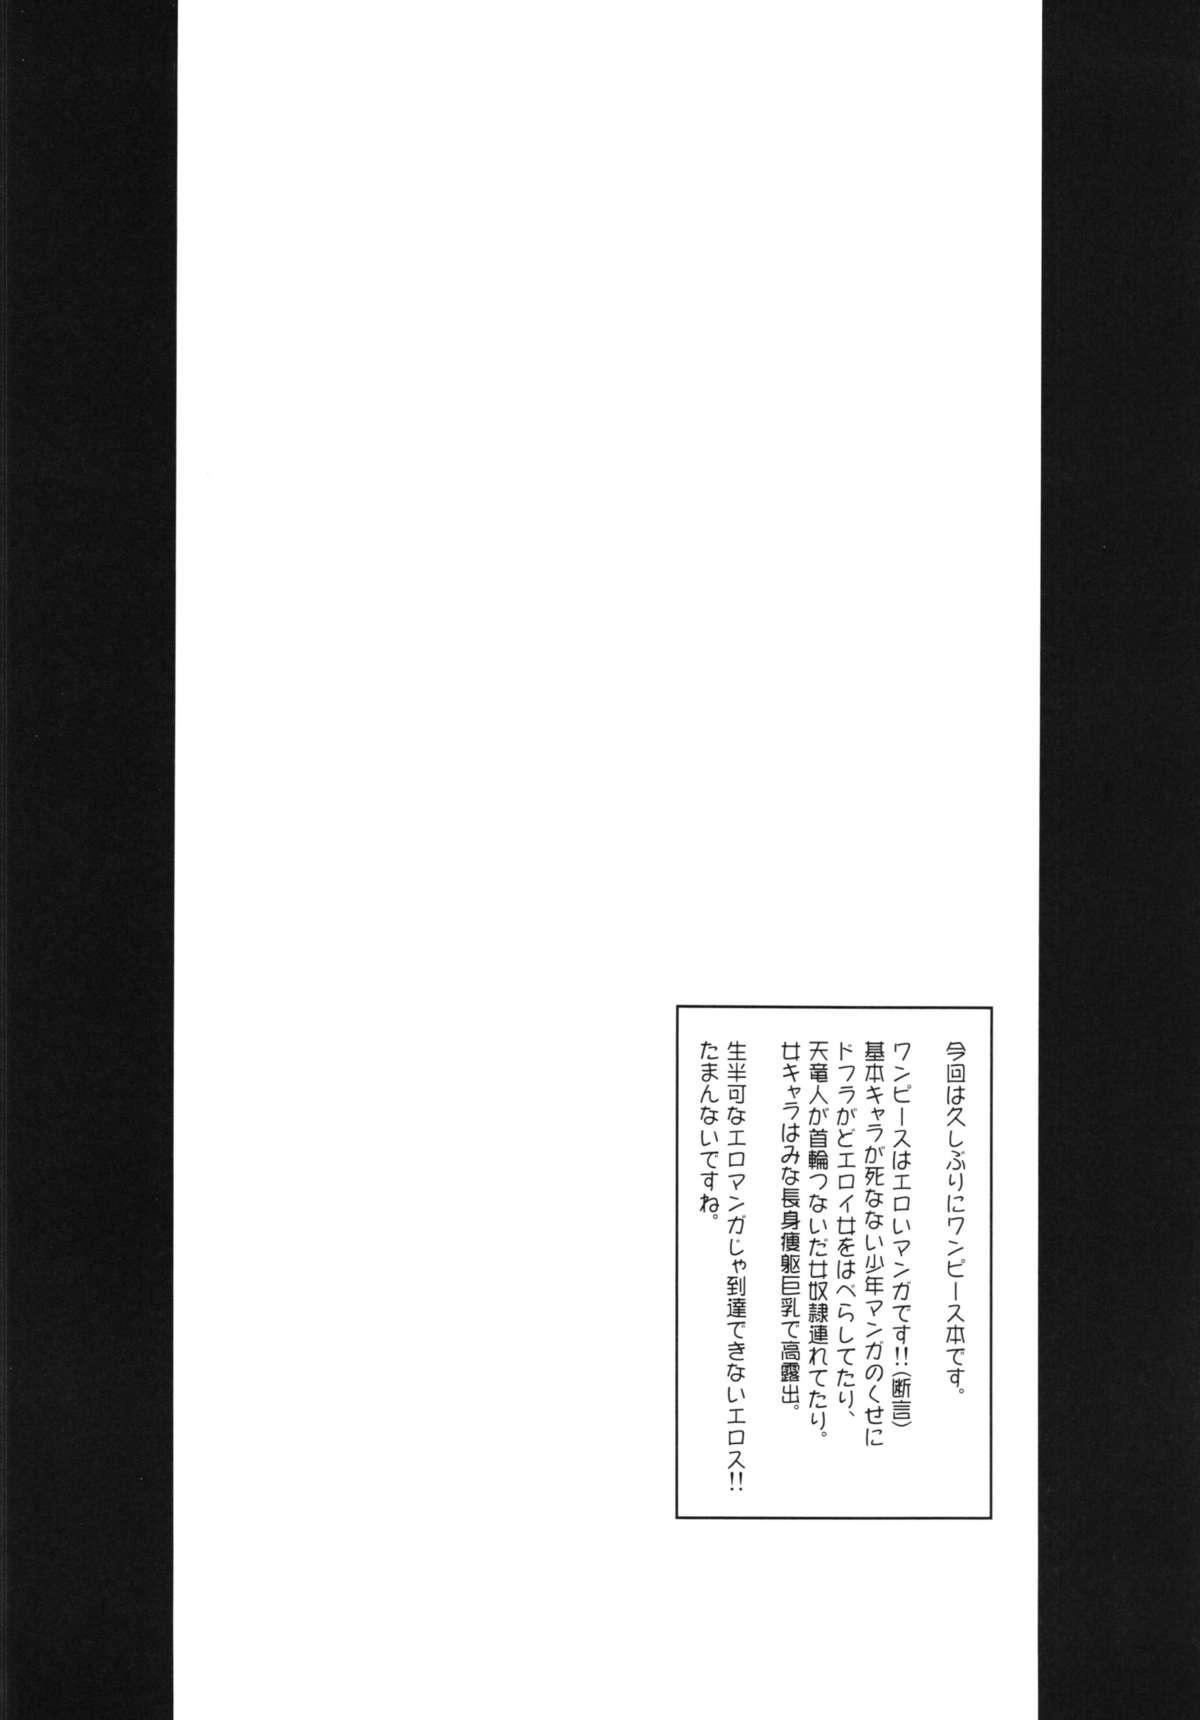 Grandline Chronicle 3 Momo ☆ Momo 3